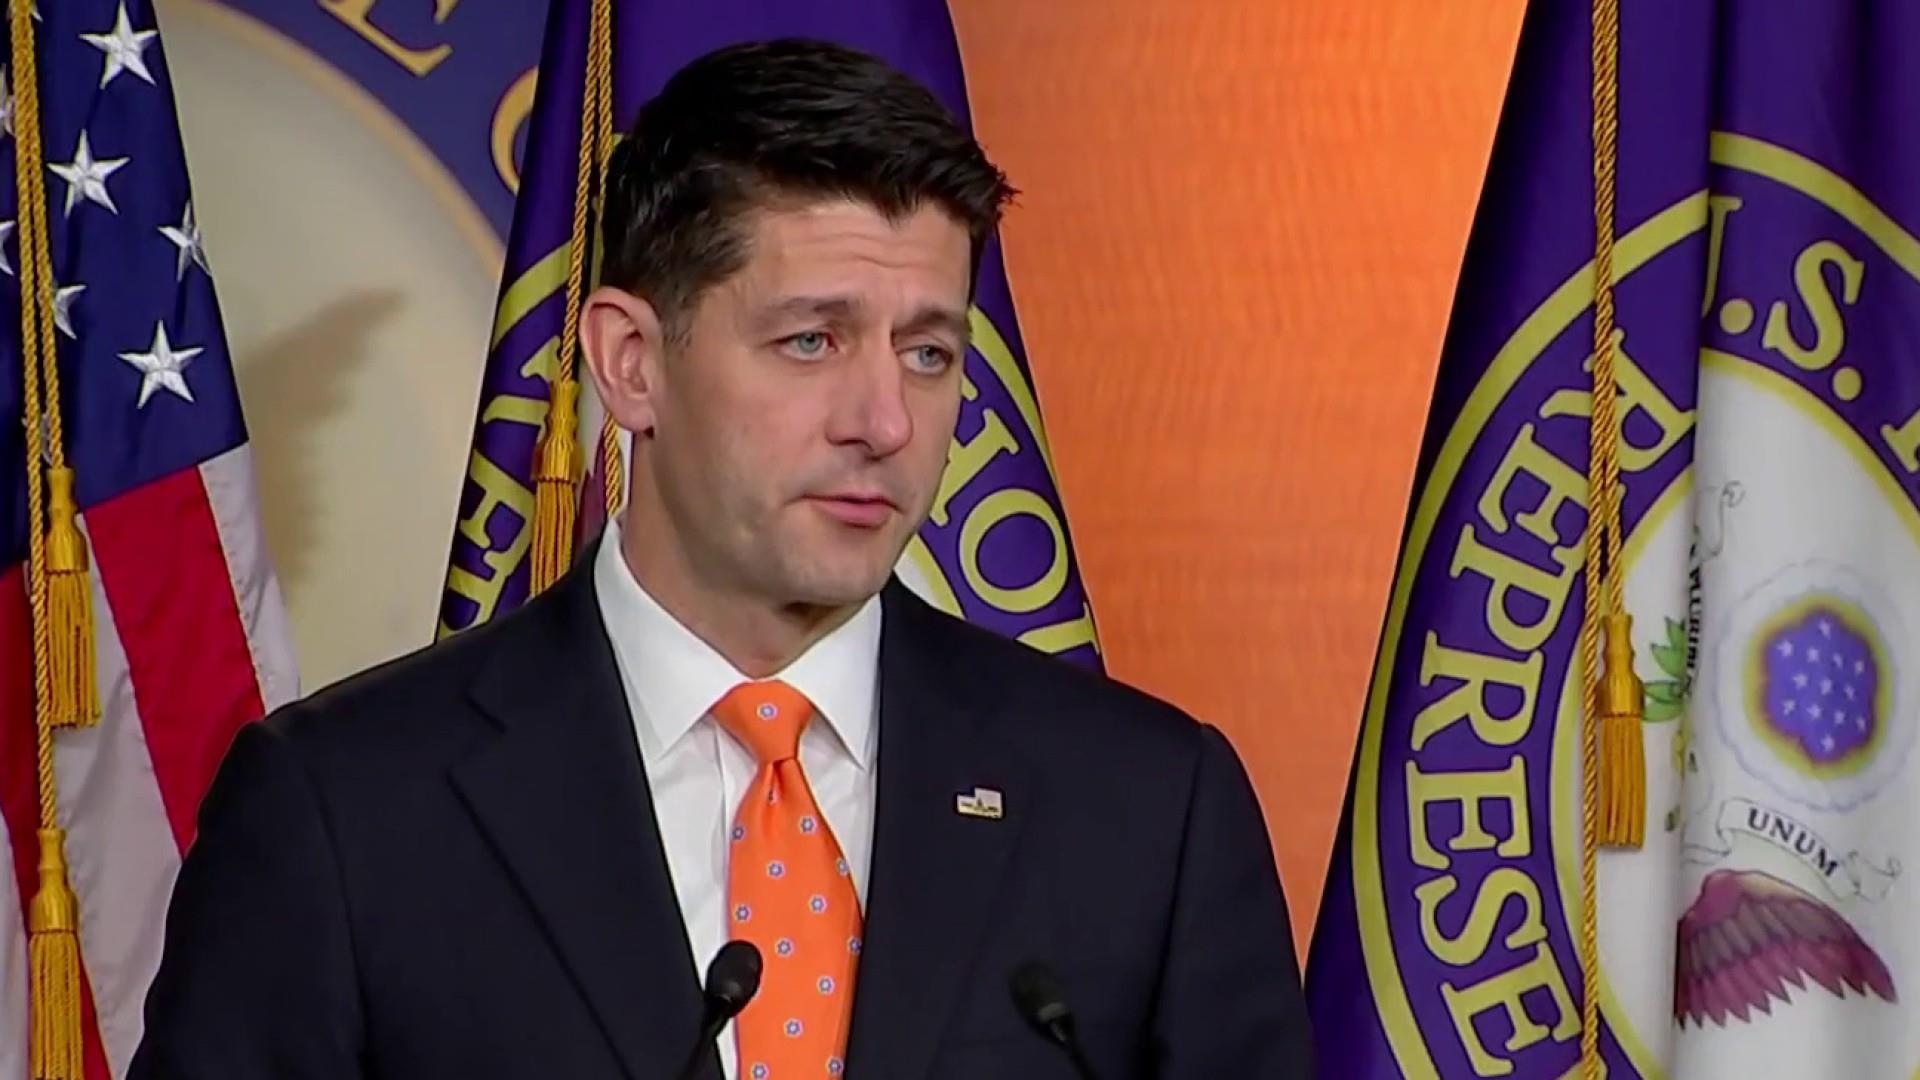 Speaker Ryan says he doesn't support Rosenstein's impeachment